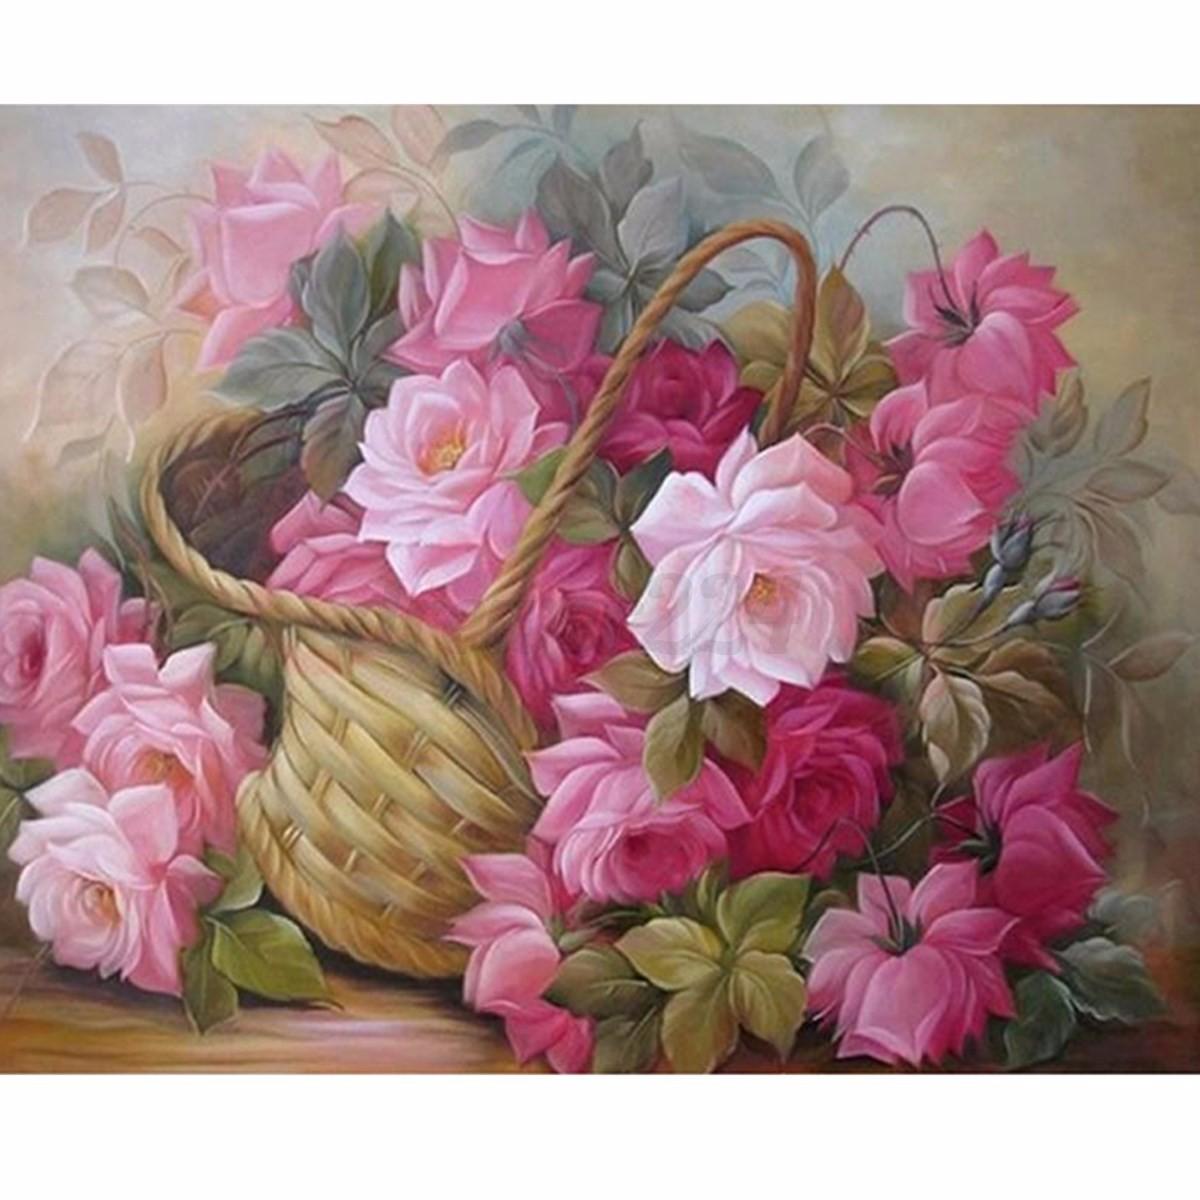 5d diy rose diamond painting cross stitch embroidery kit home wall decor 25x20cm